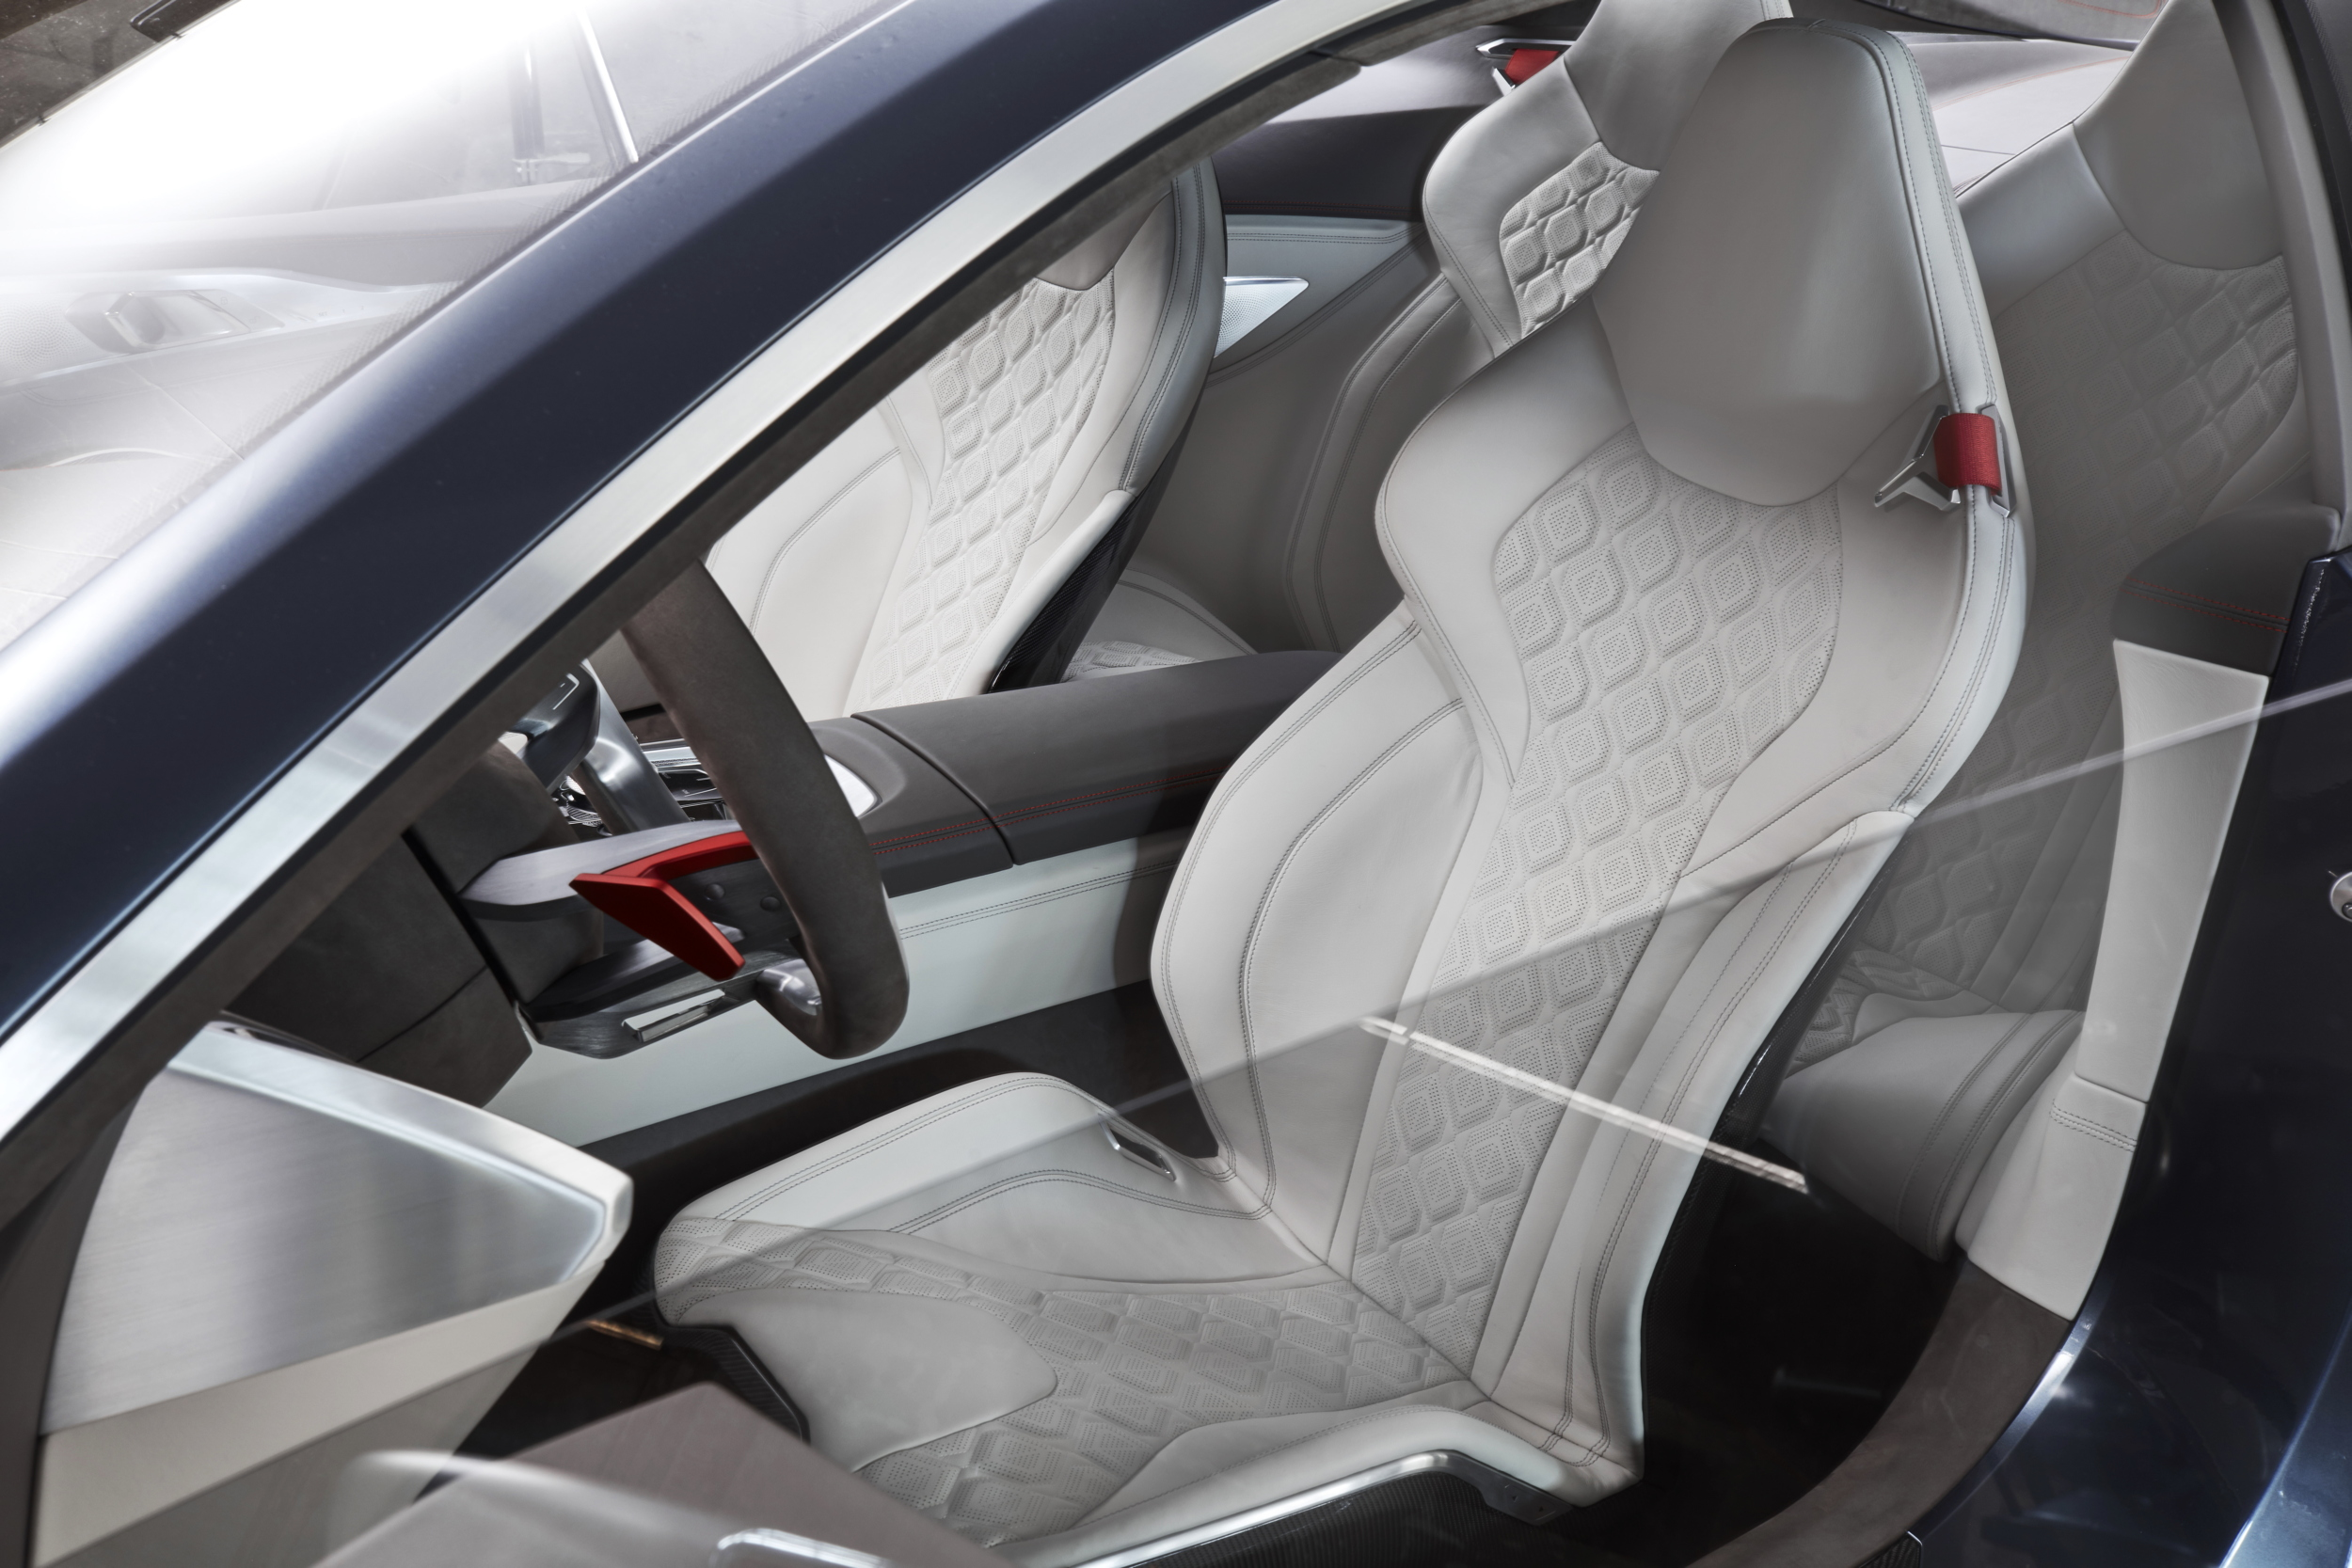 BMW Concept 8 Series seat